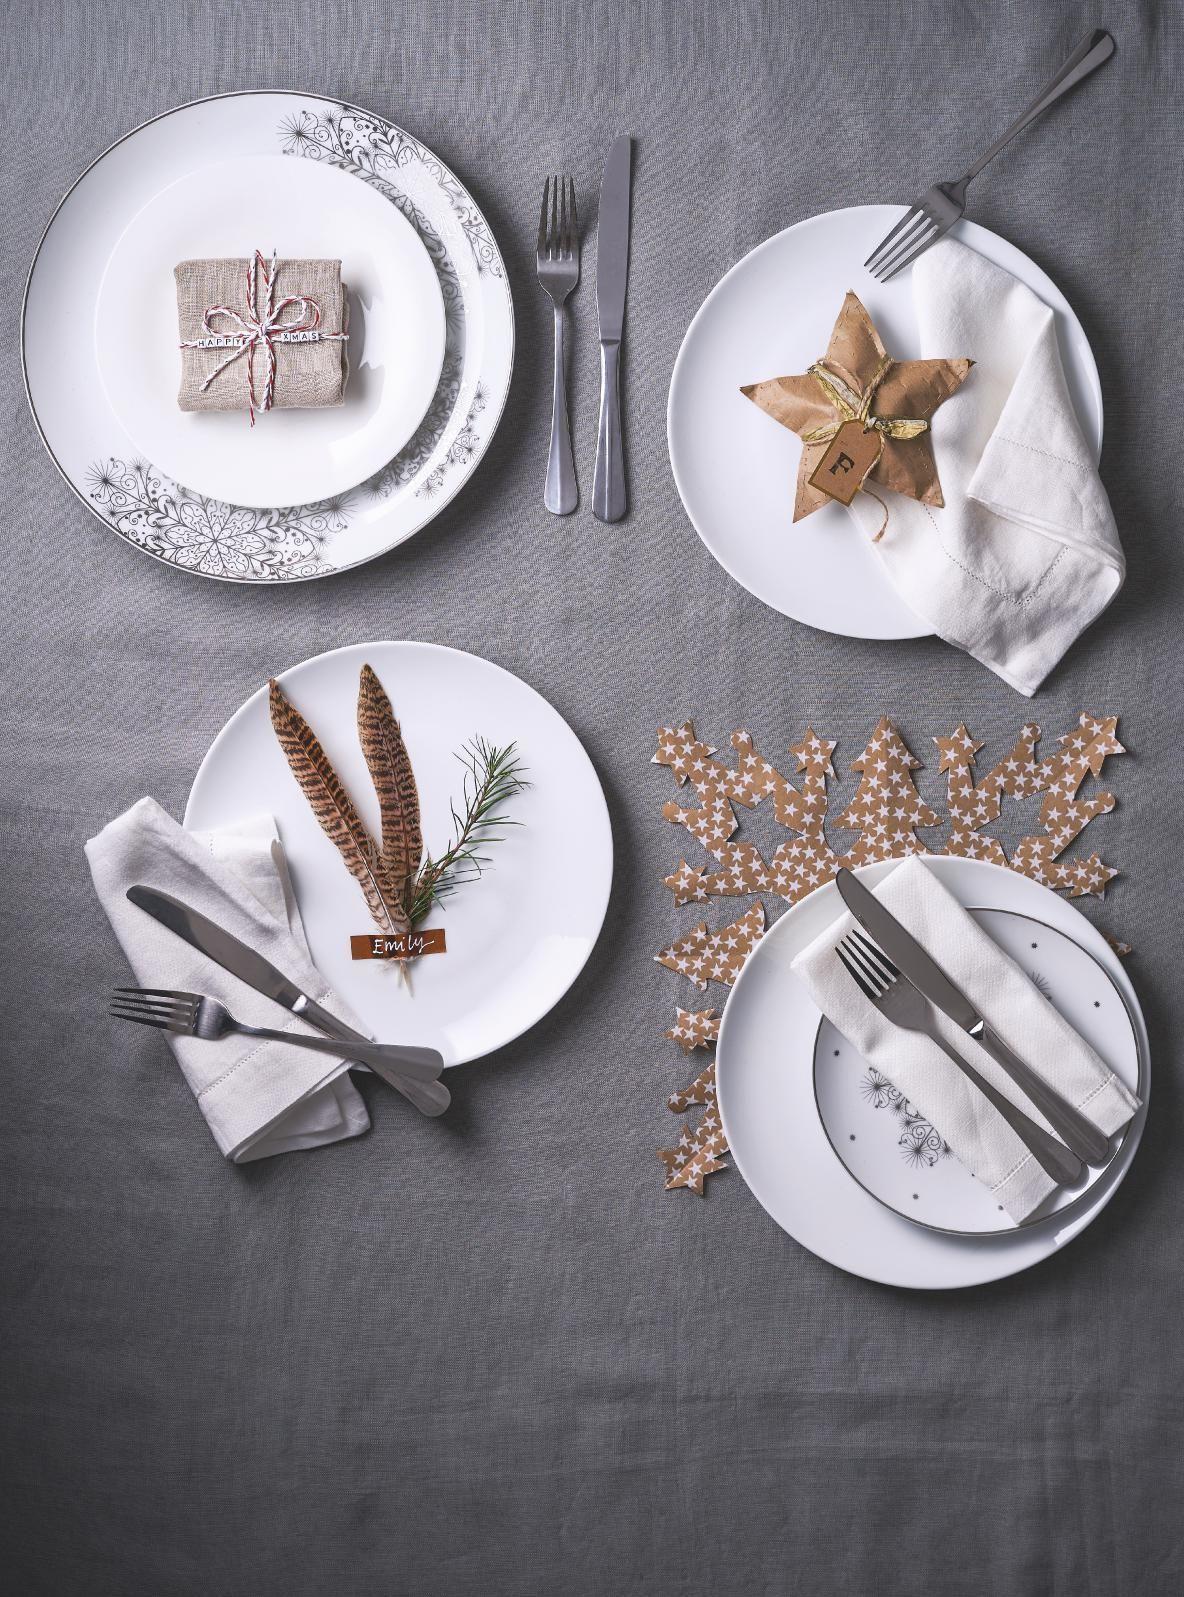 Christmas Christmas Diys Winter Diys Holiday Diys Holiday Diy Ideas Holiday Decor Ideas Holiday Decoration Simple Holiday Decor Simple Holidays Fun Decor